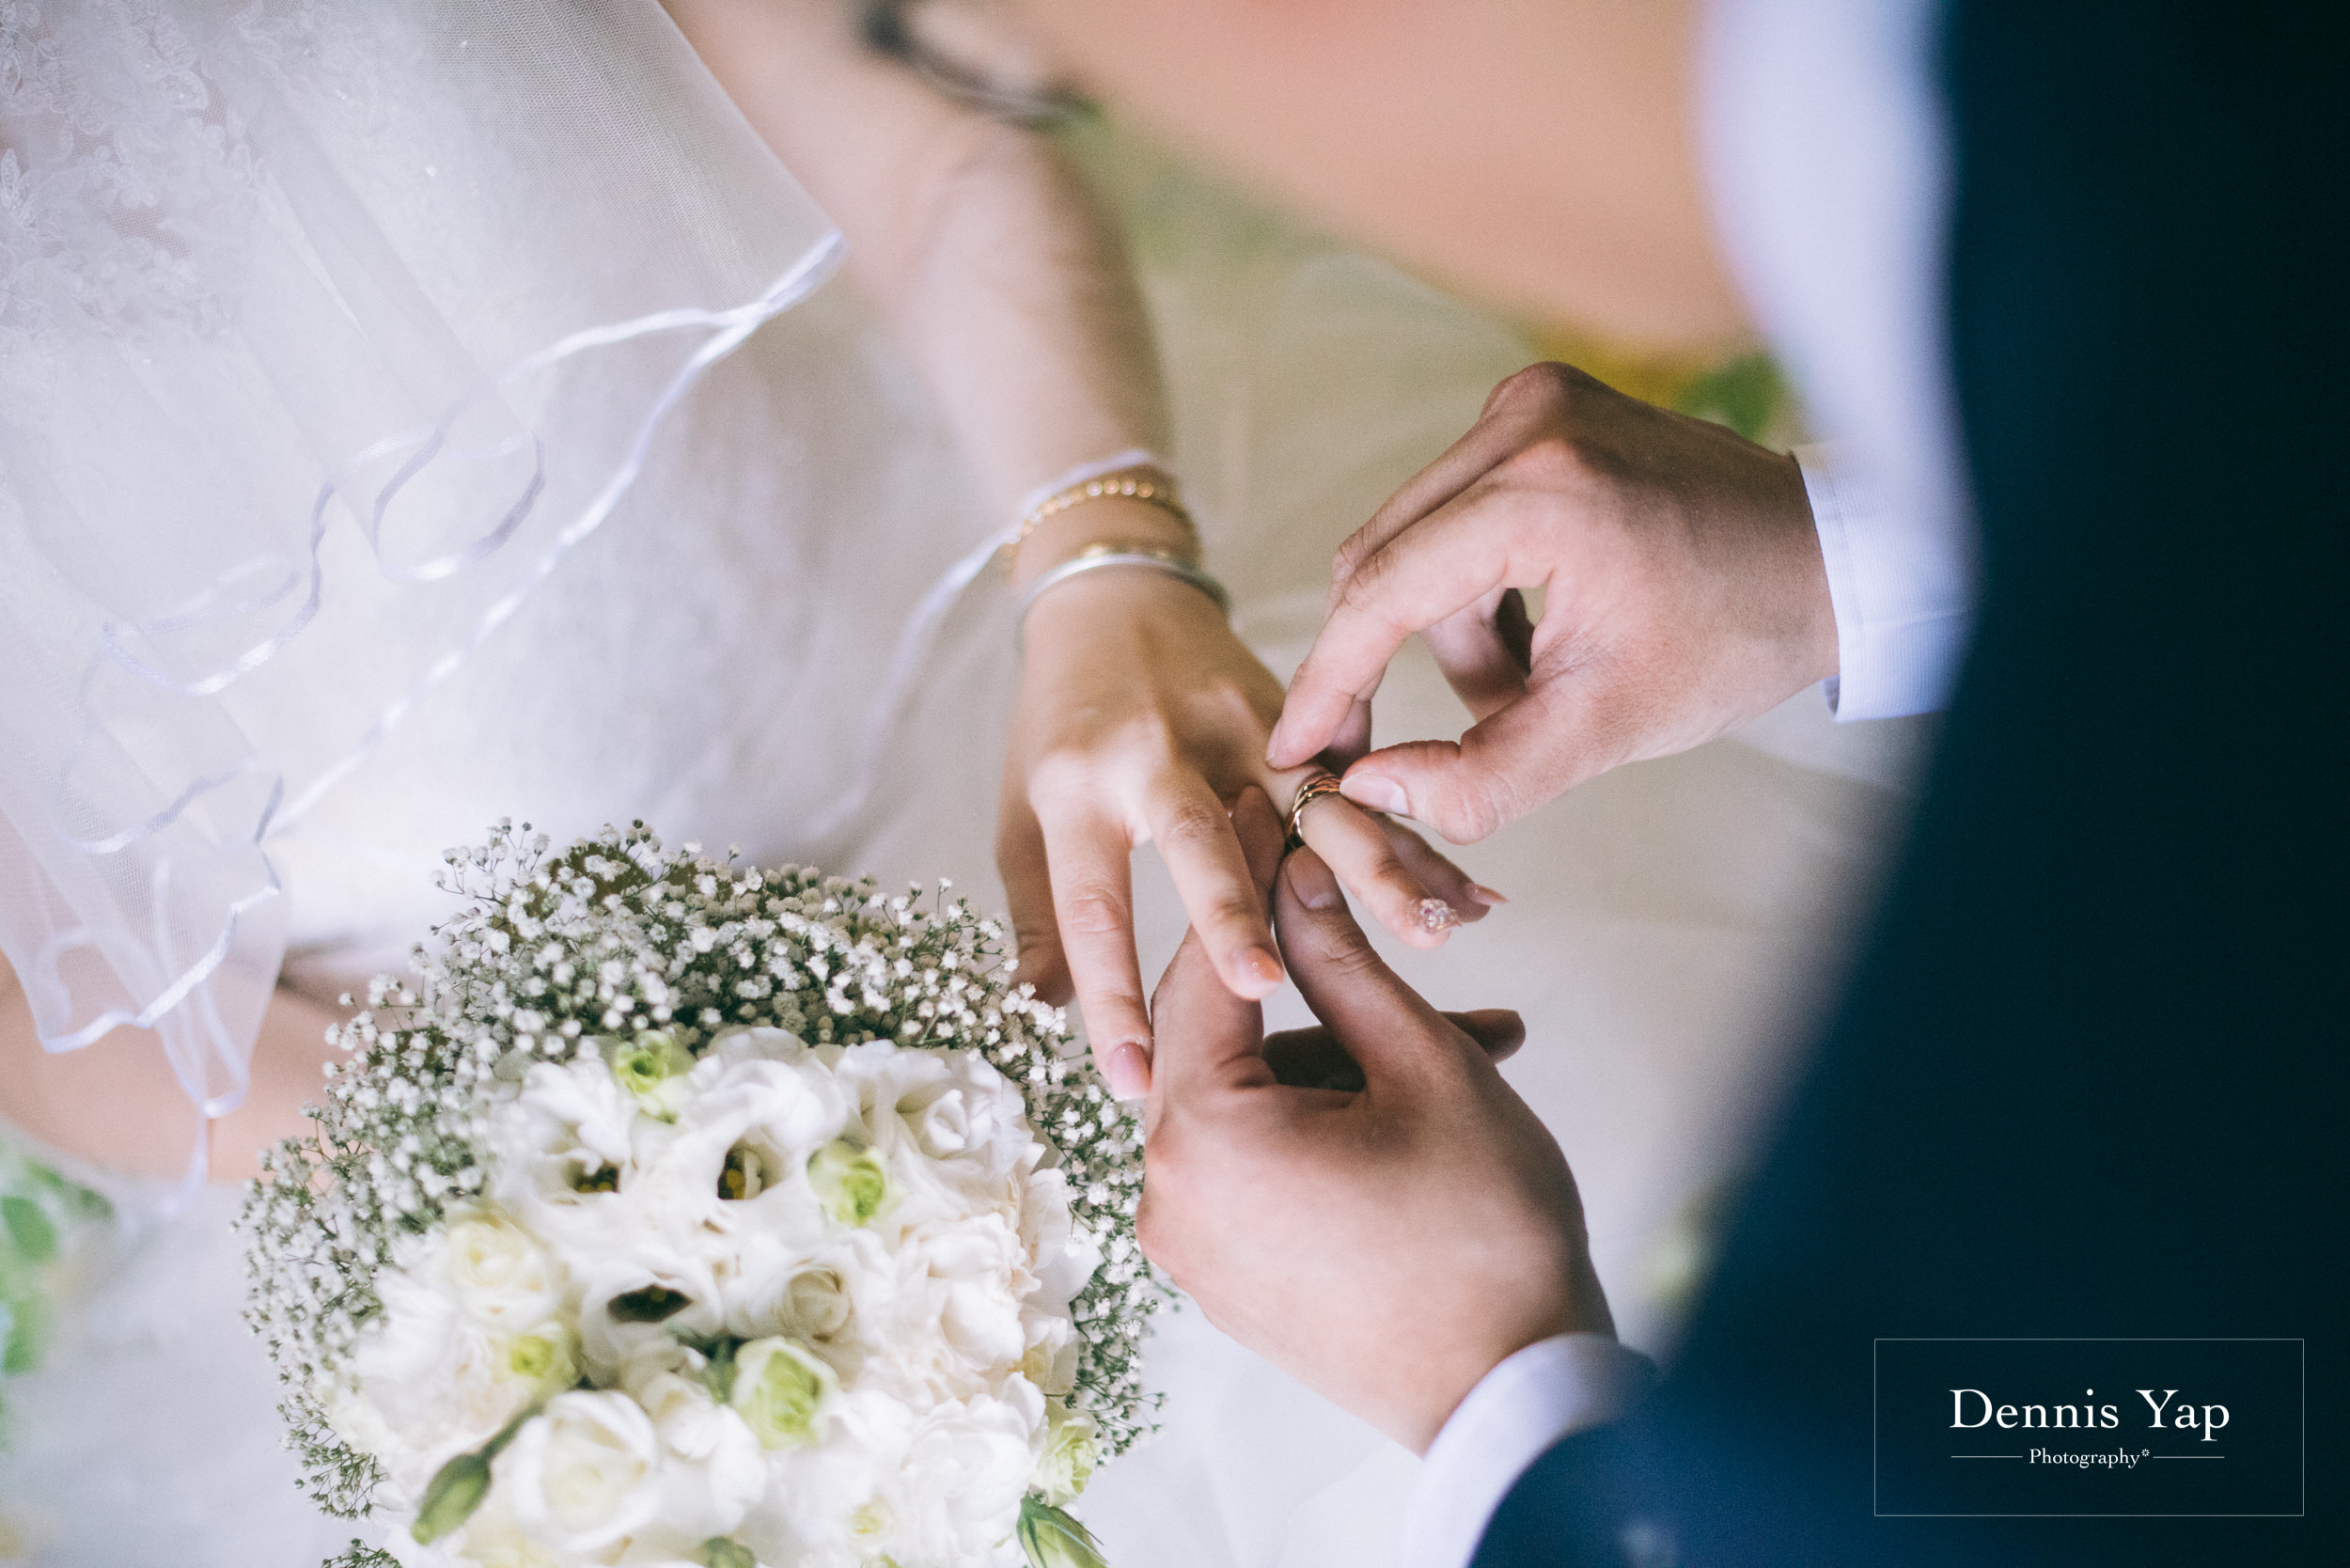 kok jin hooi woon wedding day klang dennis yap photography-10.jpg